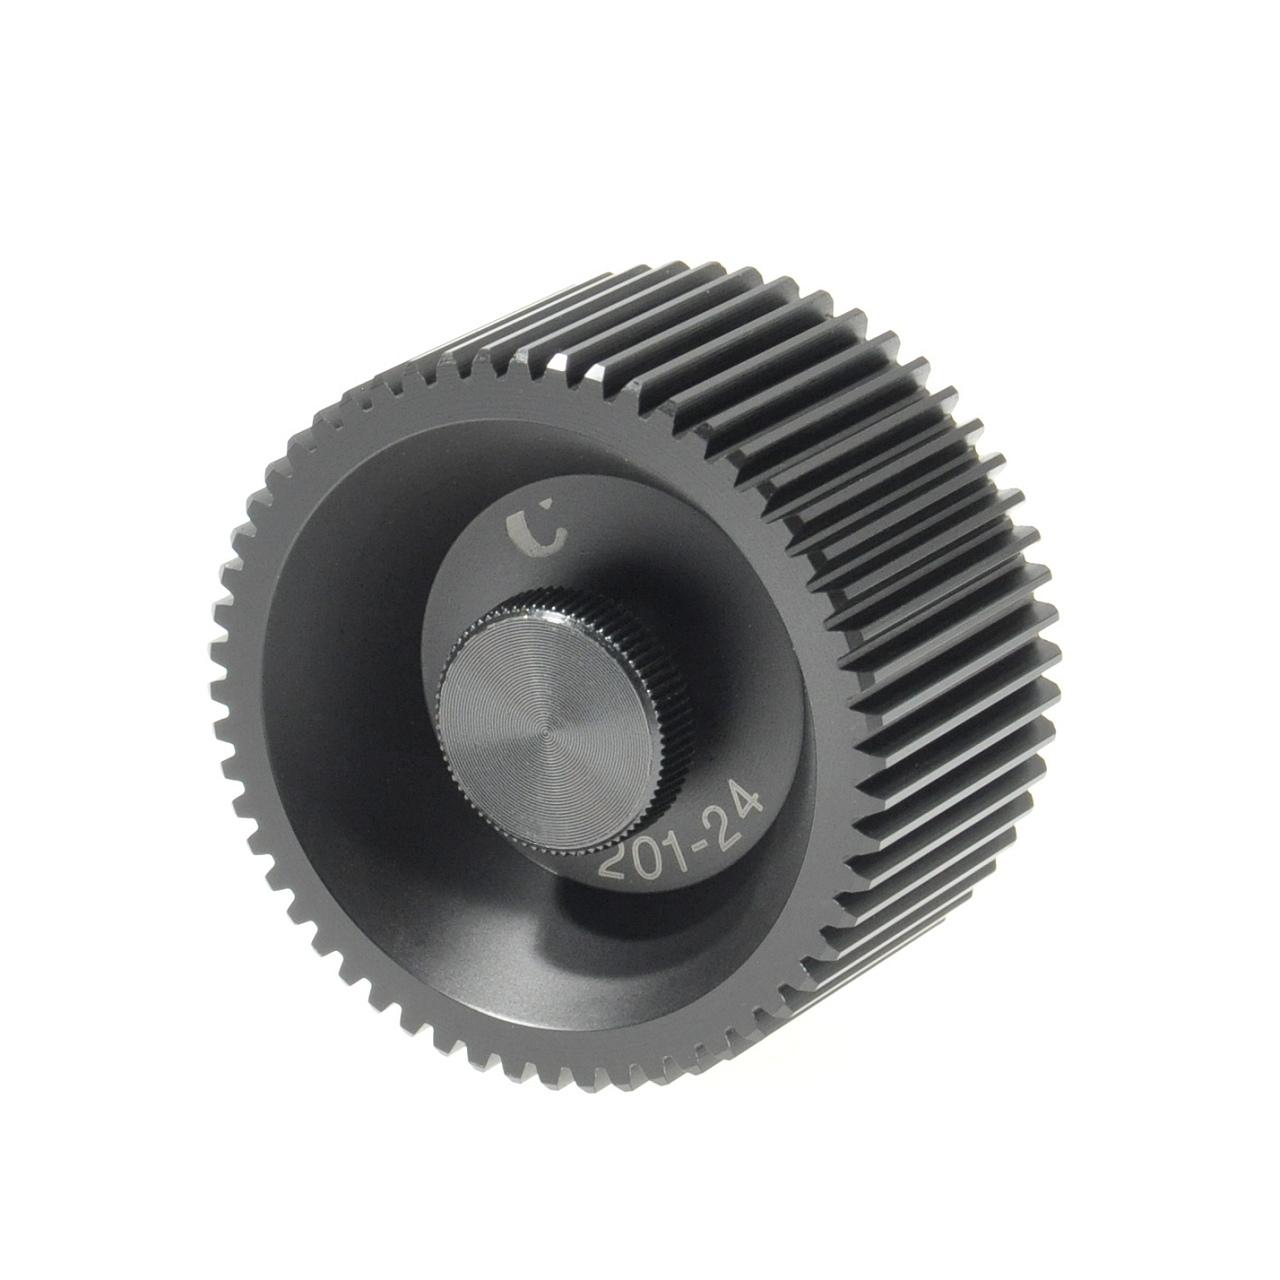 Focus Drive 0.8, Ø46,4mm,B26